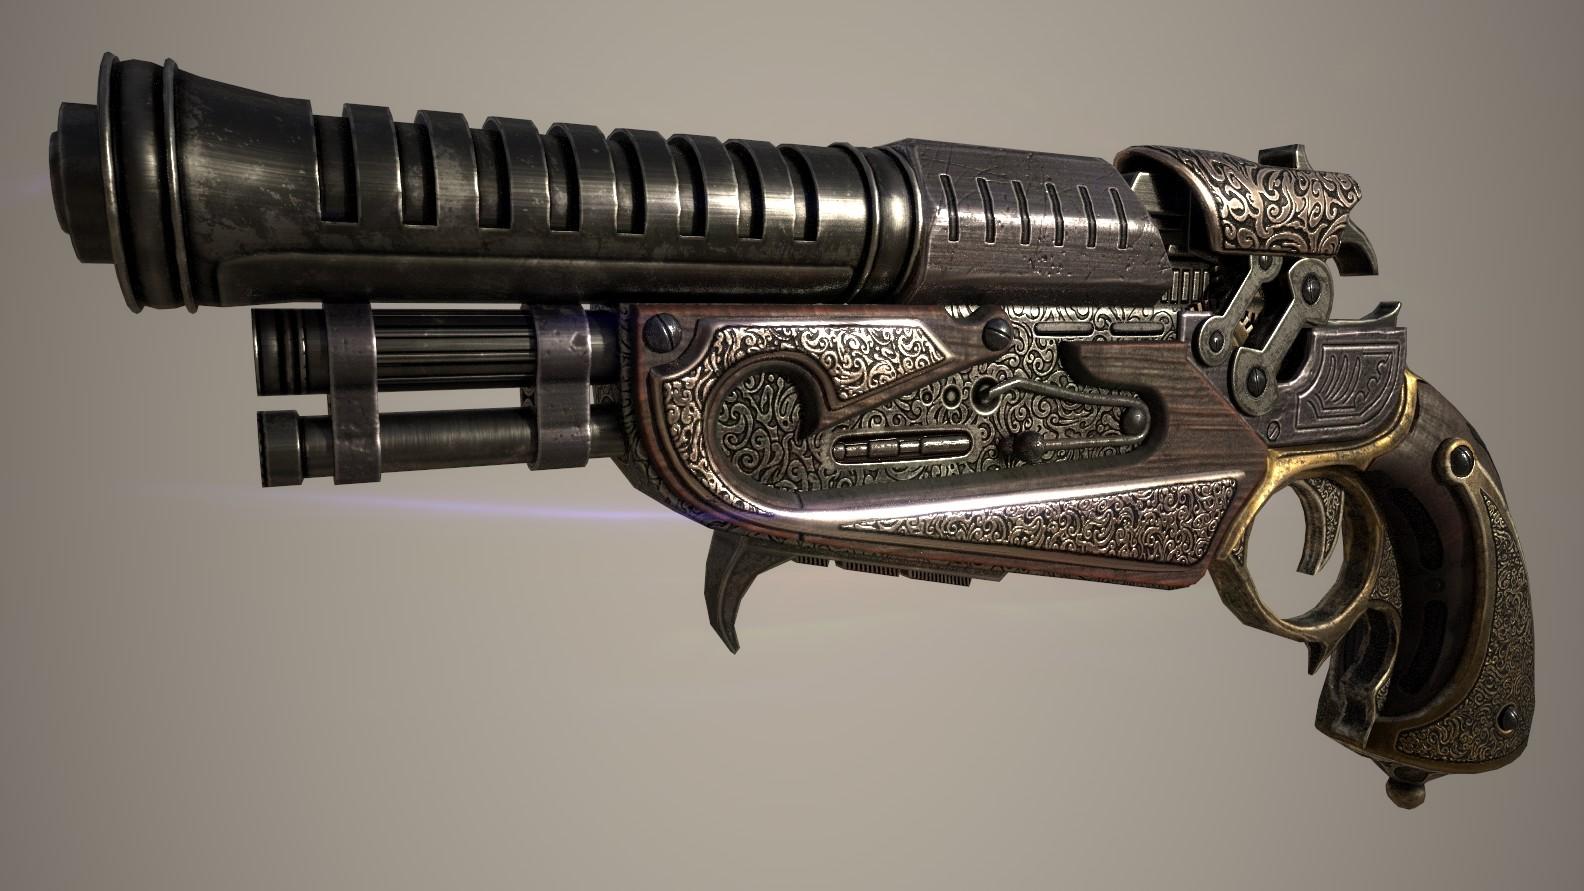 Prince luthra gun09